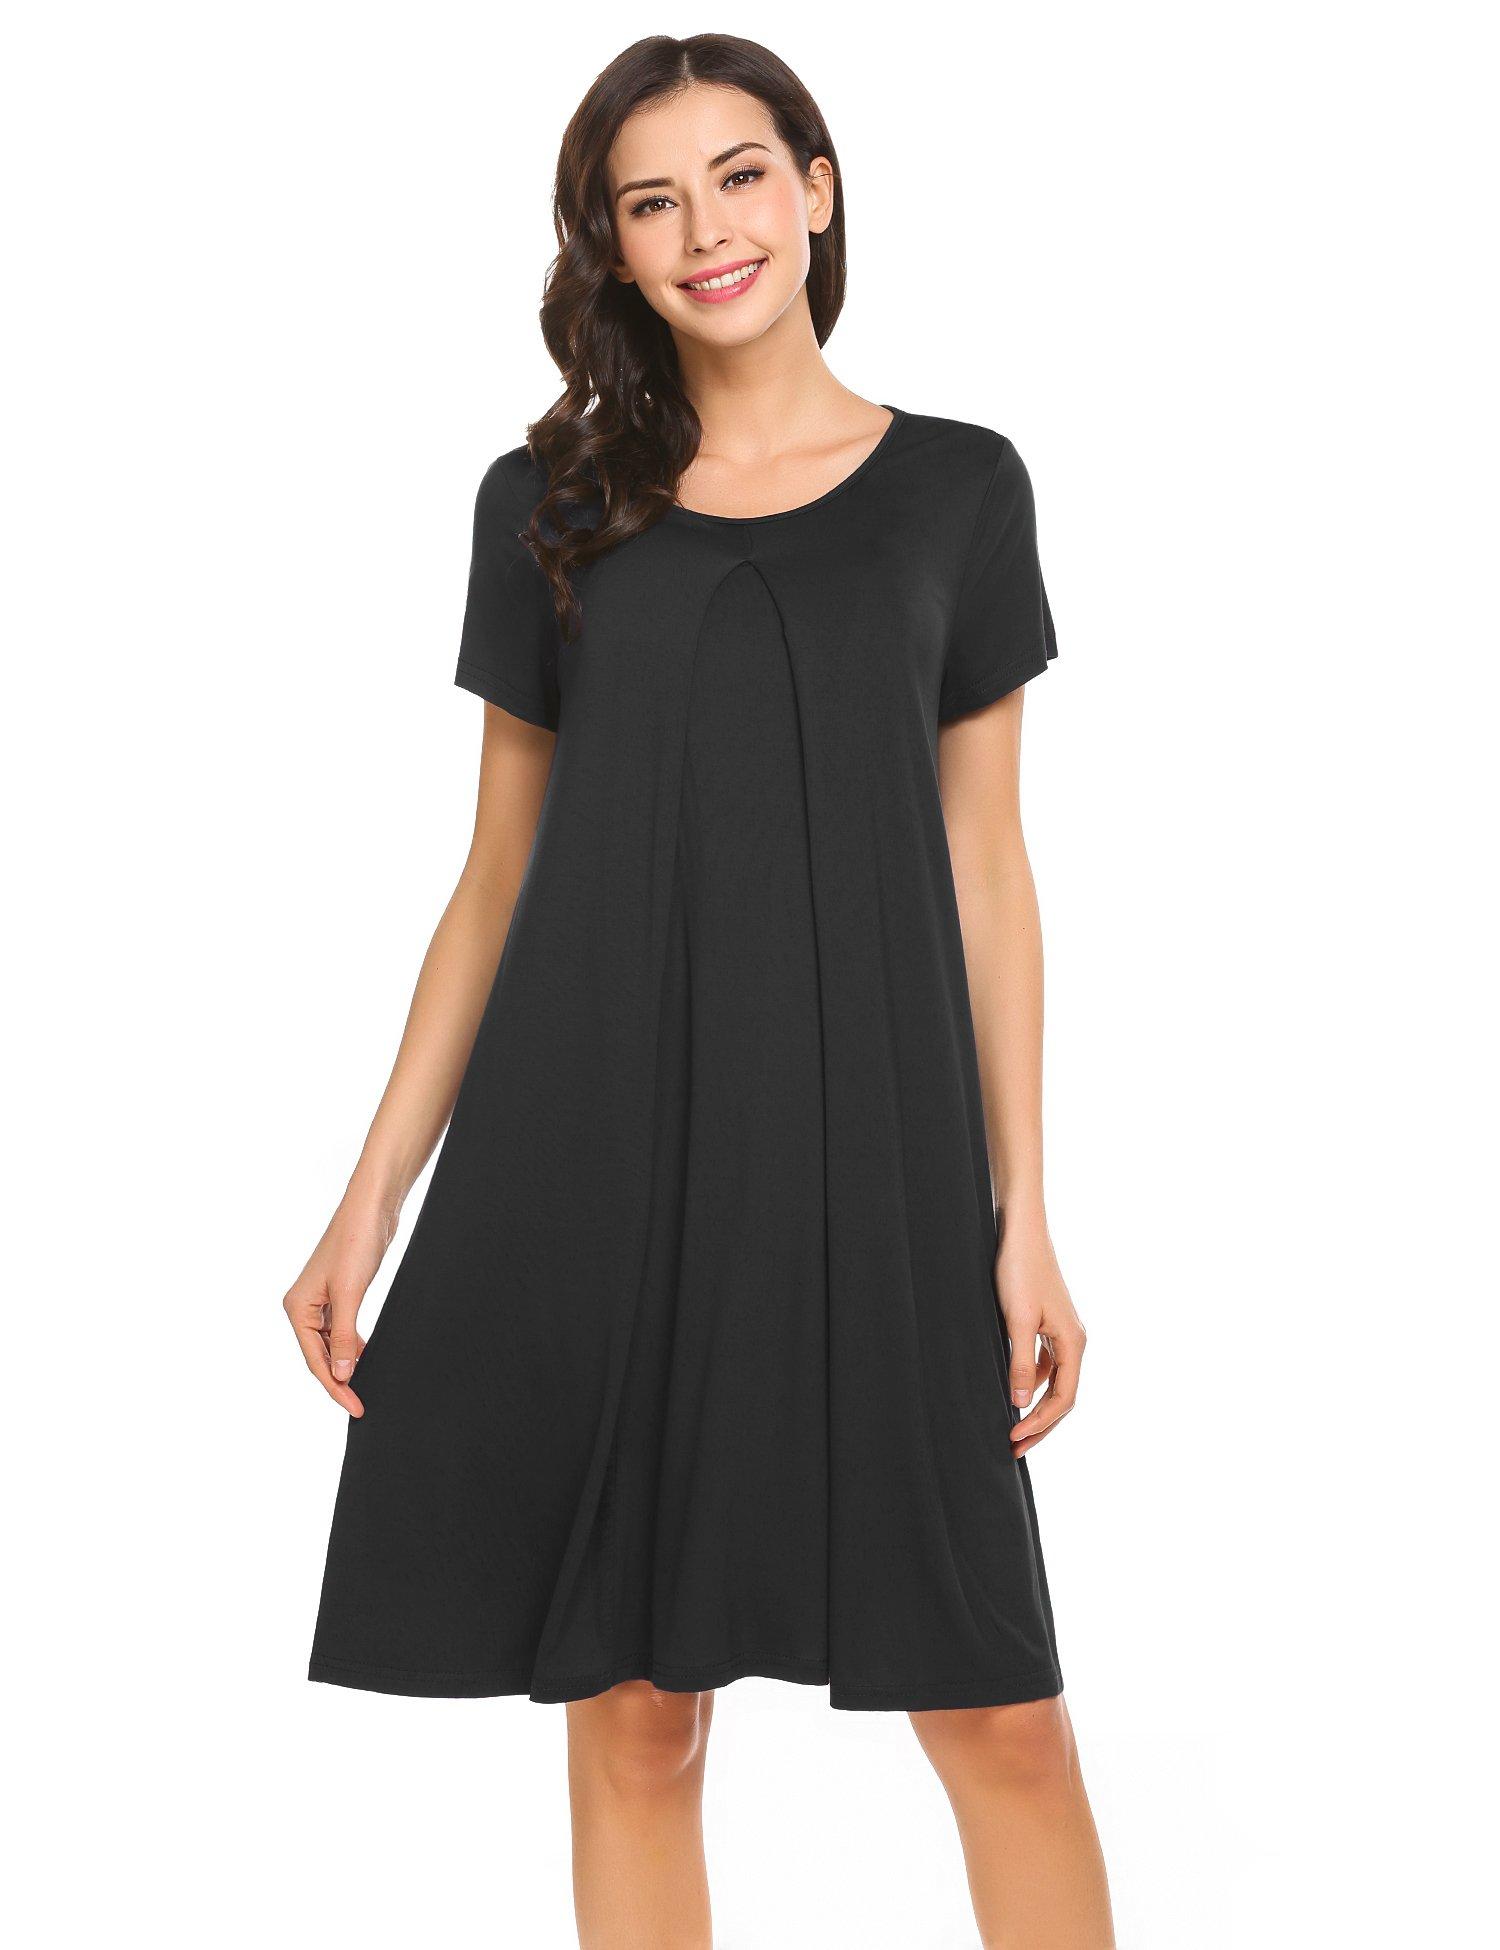 Ekouaer Womens Maternity Nursing Nightgown Round Neck Short Sleeve Sleep Dress, 8907black, X-Large